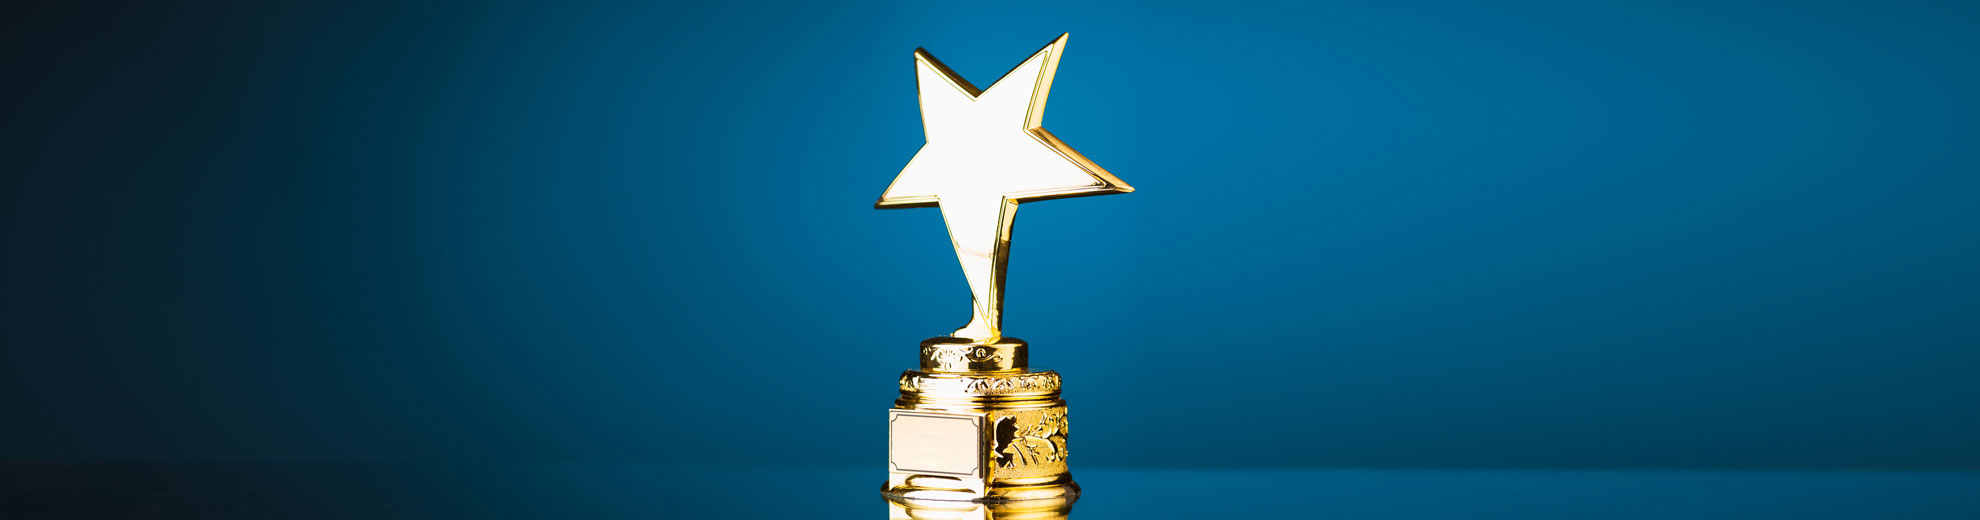 Do Awards = Legitimacy?